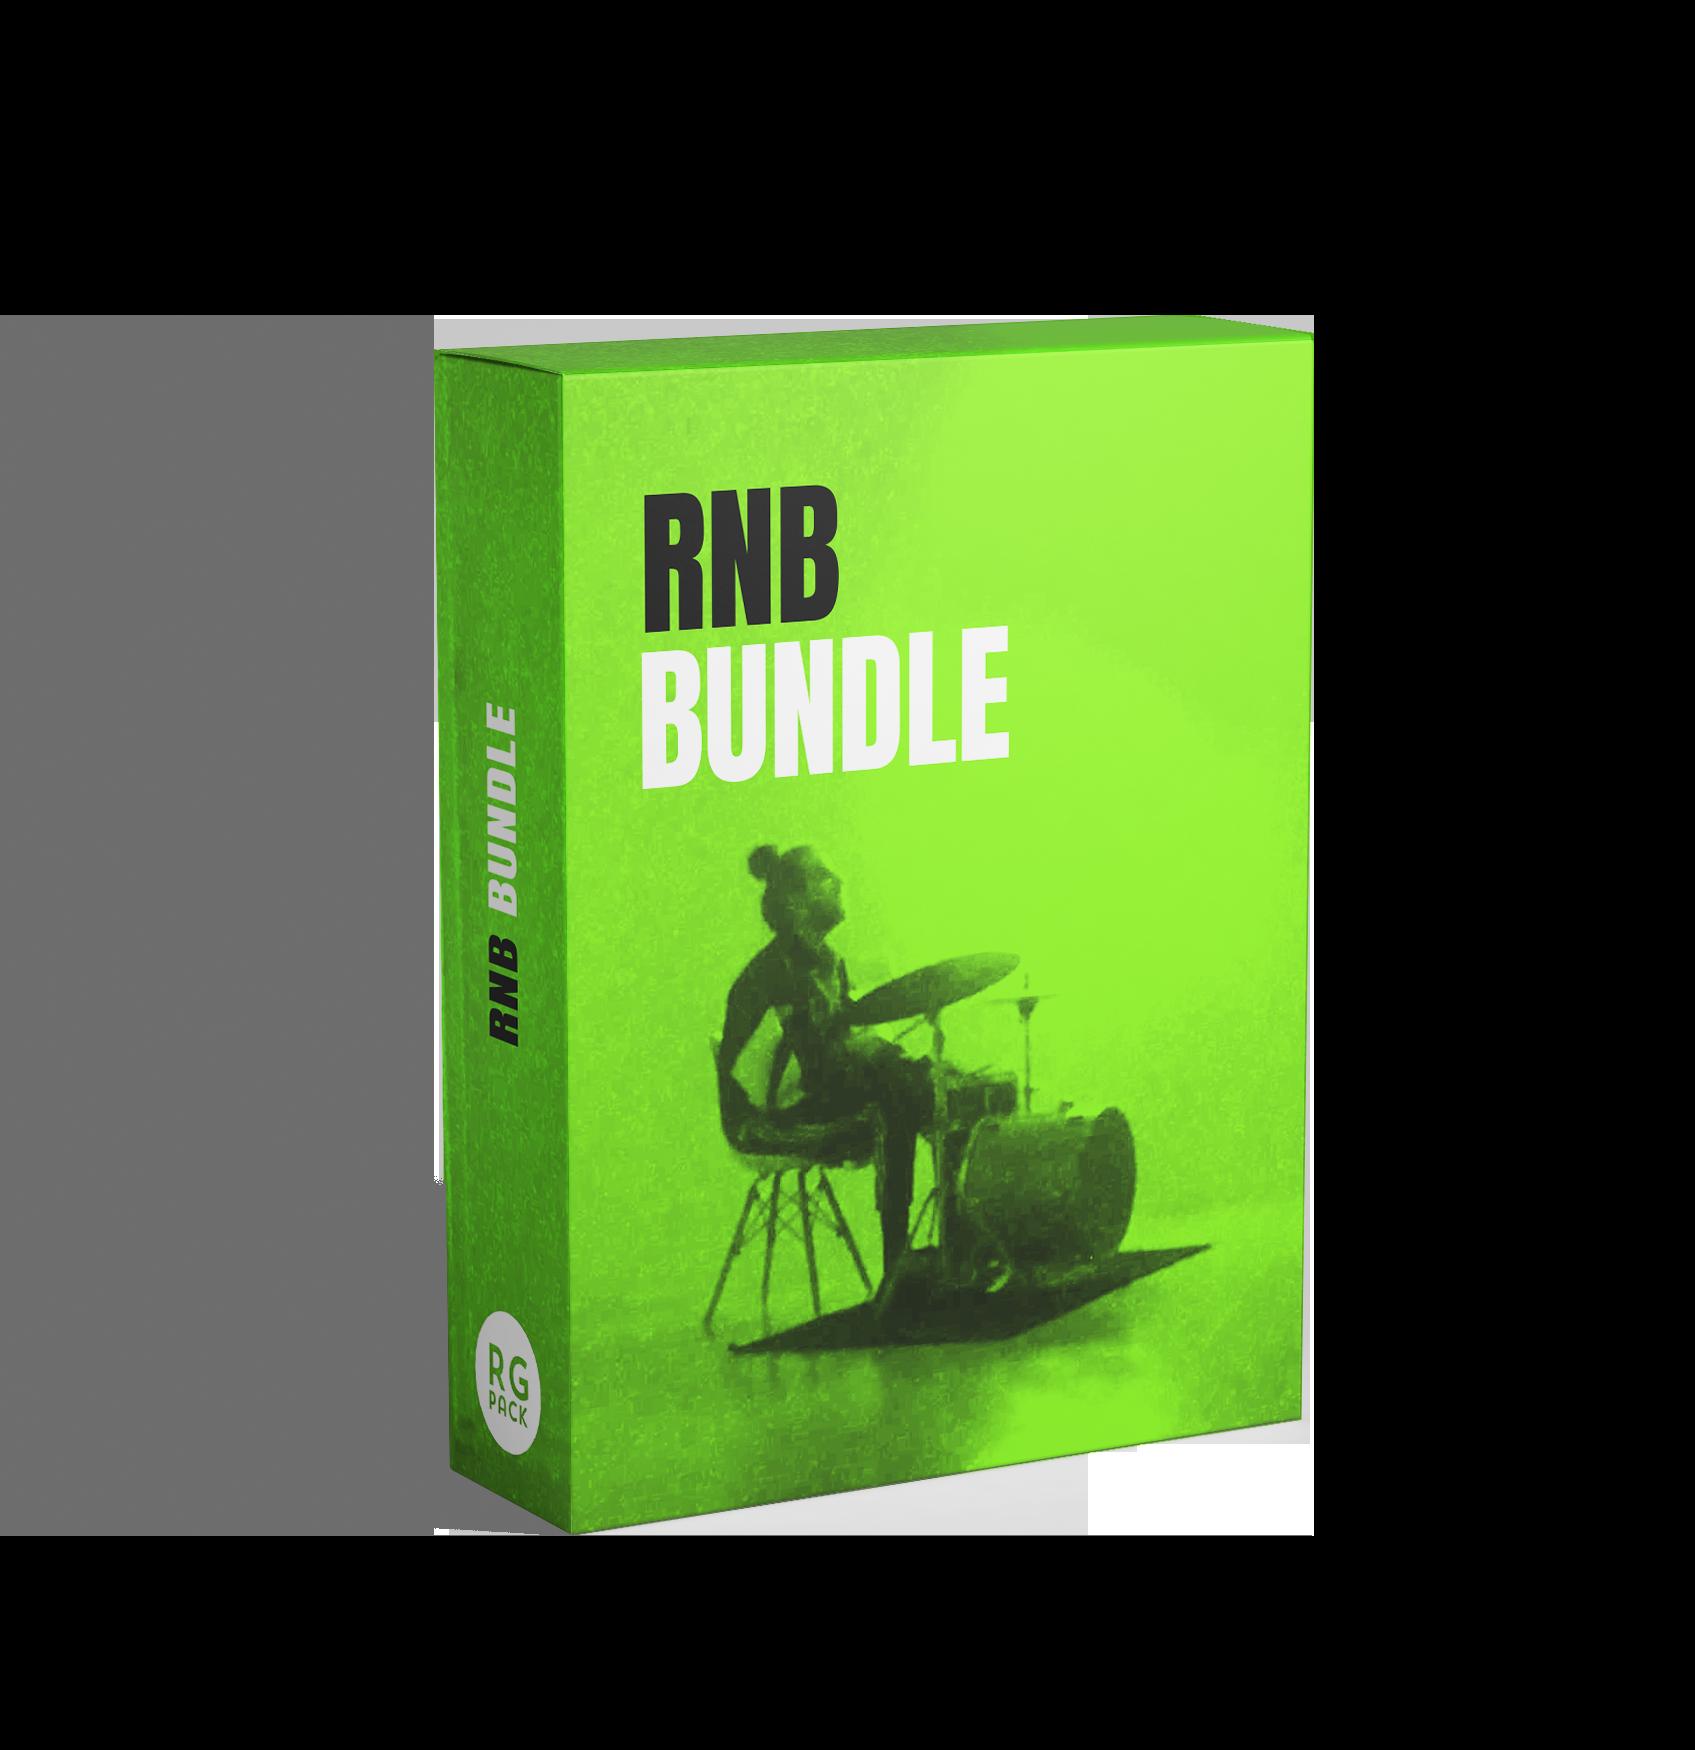 RnB Bundle